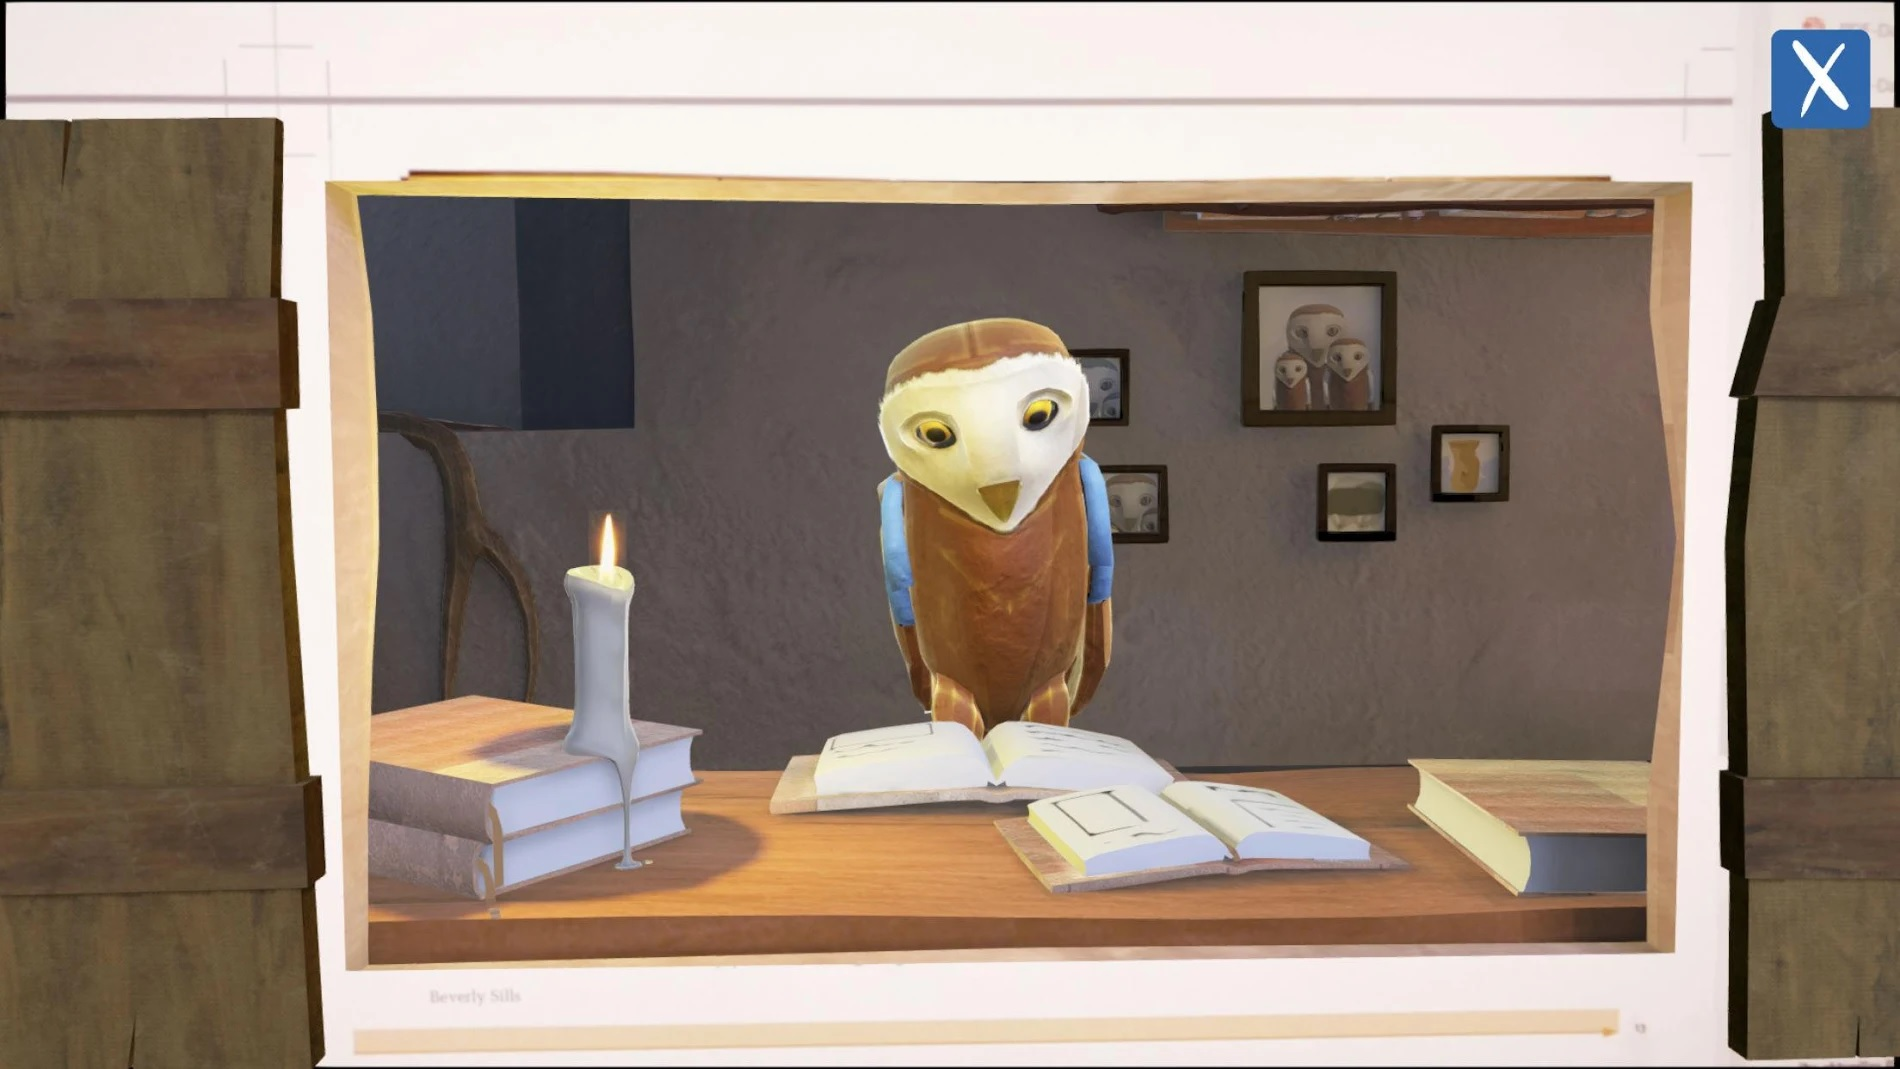 DAAD AR owl